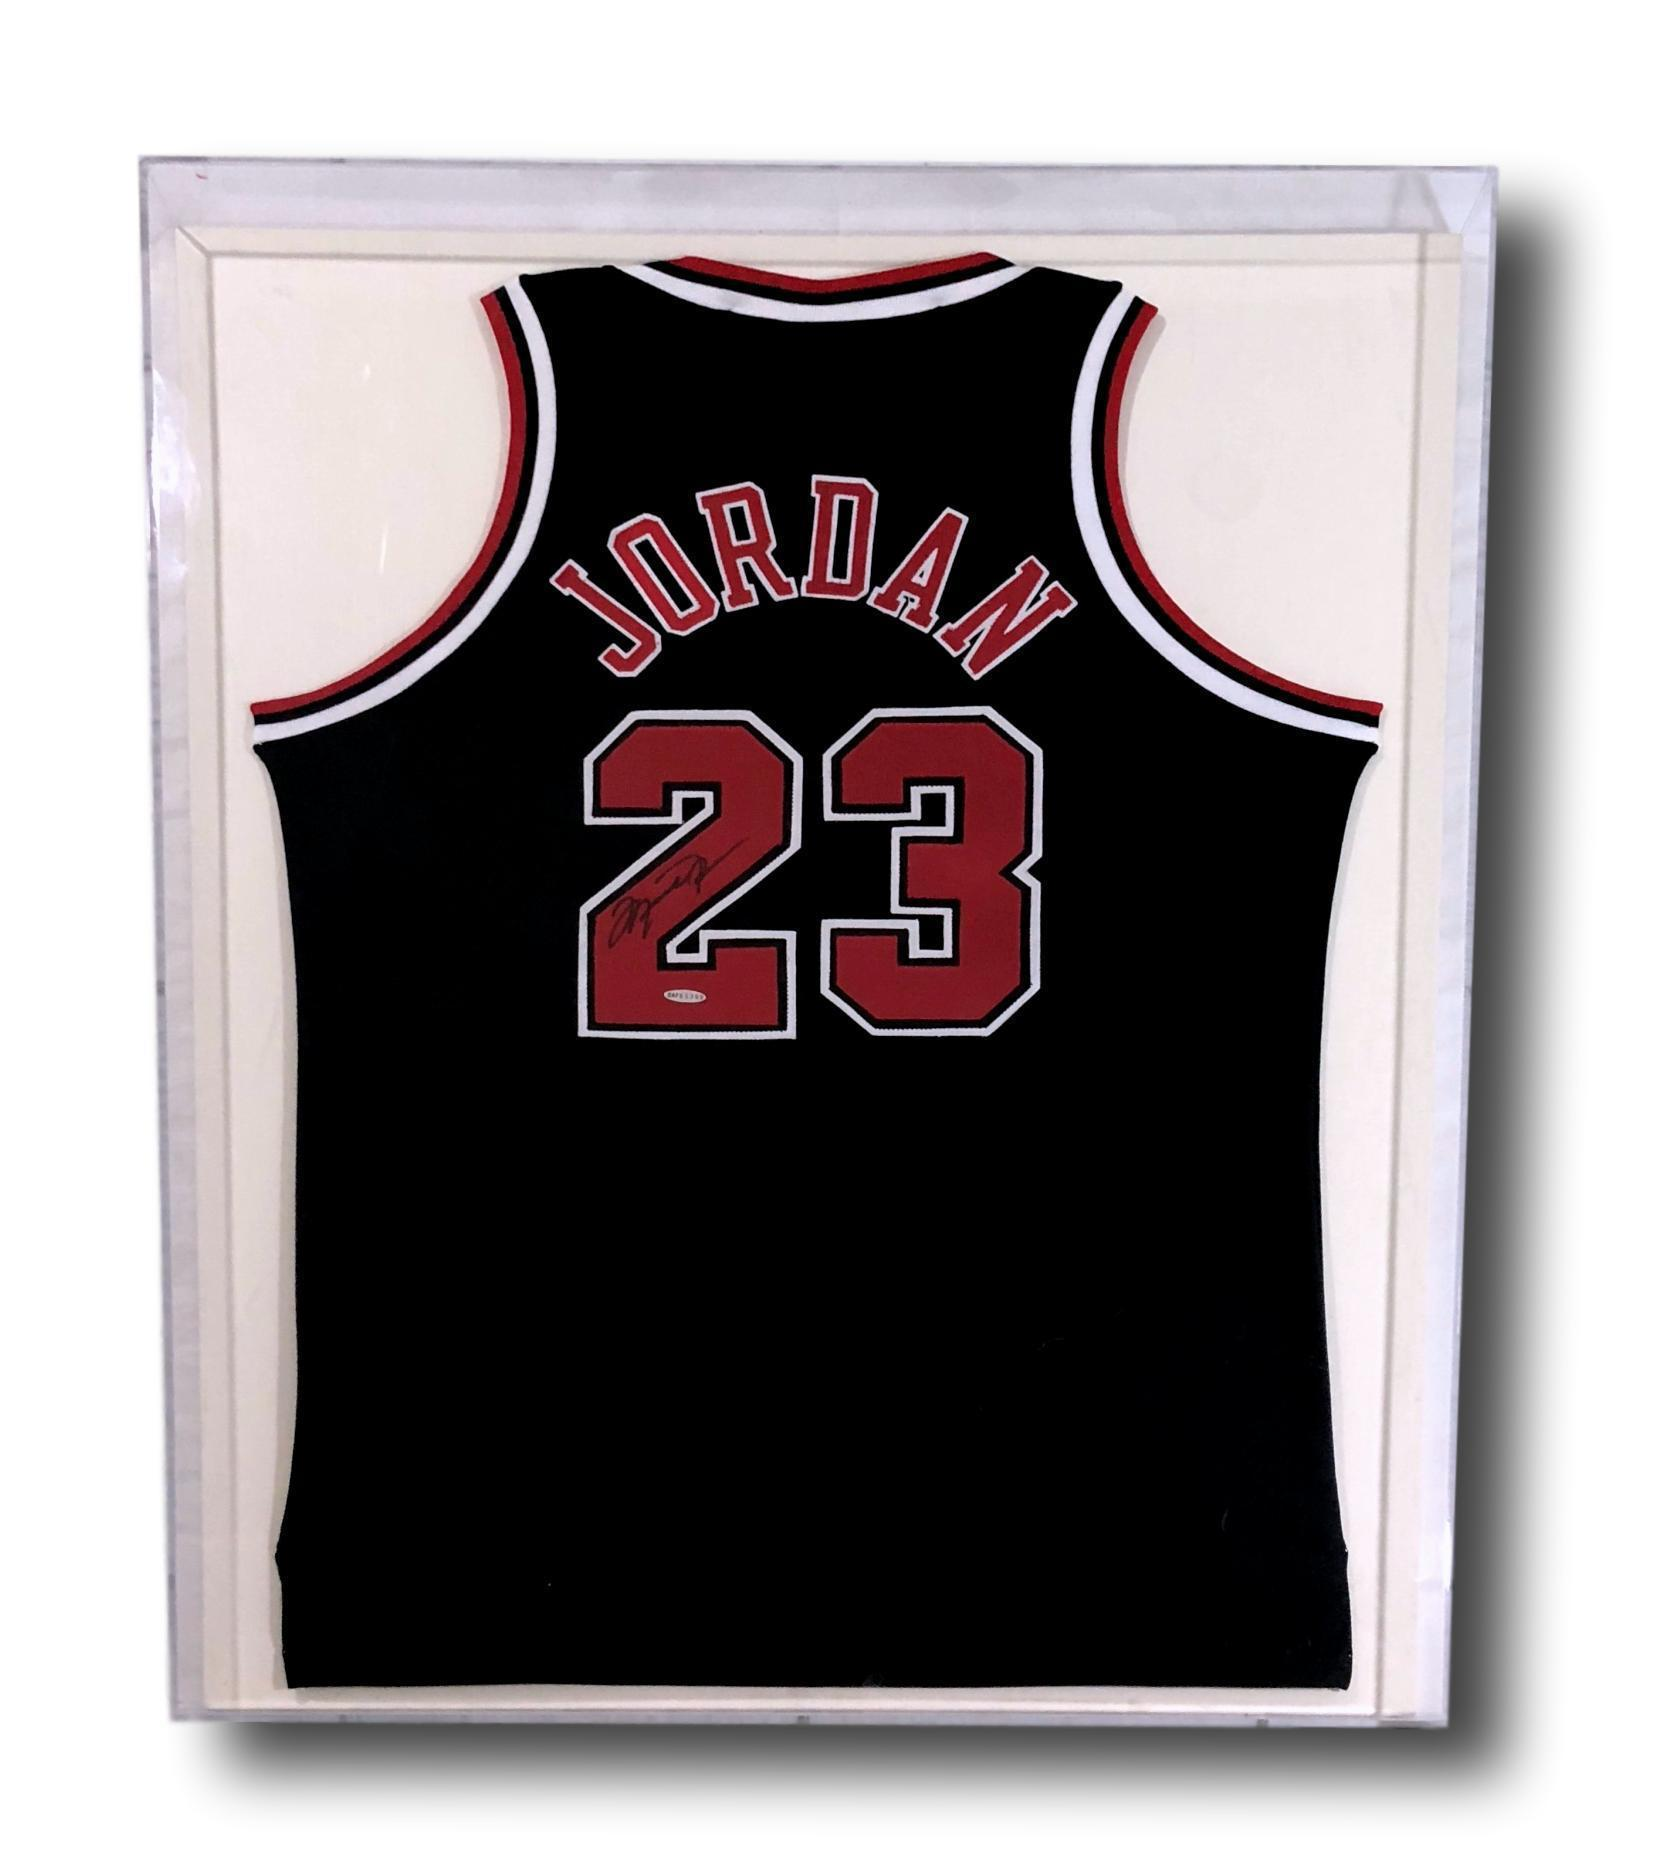 32ce80c086d38 Michael Jordan Signed & Framed Chicago Bulls Black Jersey Uda COA ...